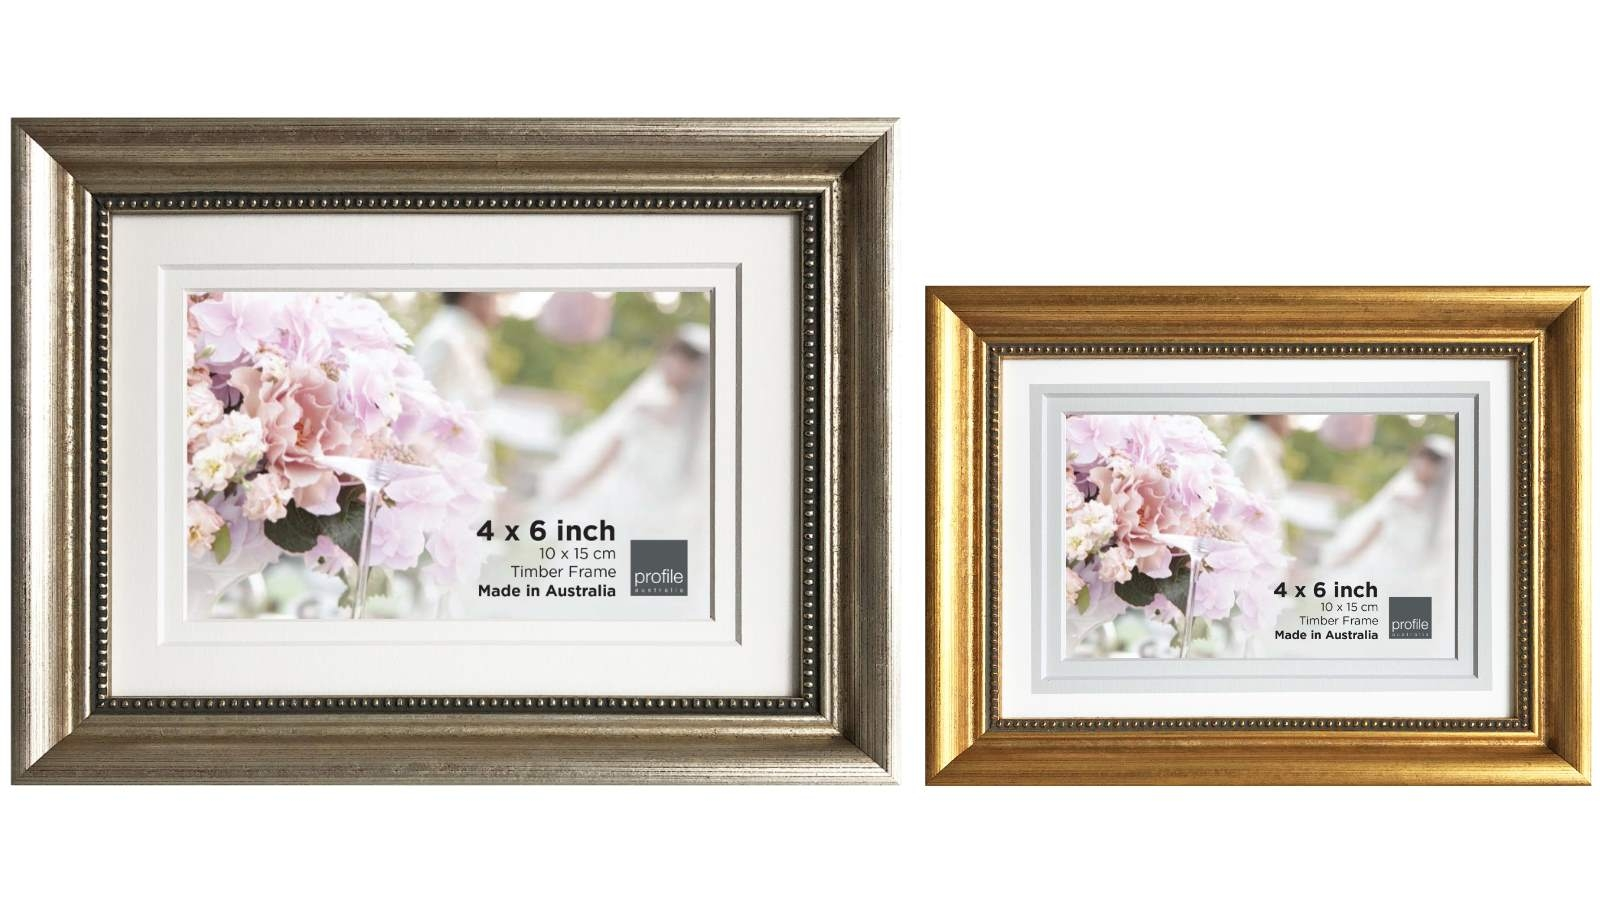 Image of Platinum Majestic 25x30cm/15x20cm Photo Frame